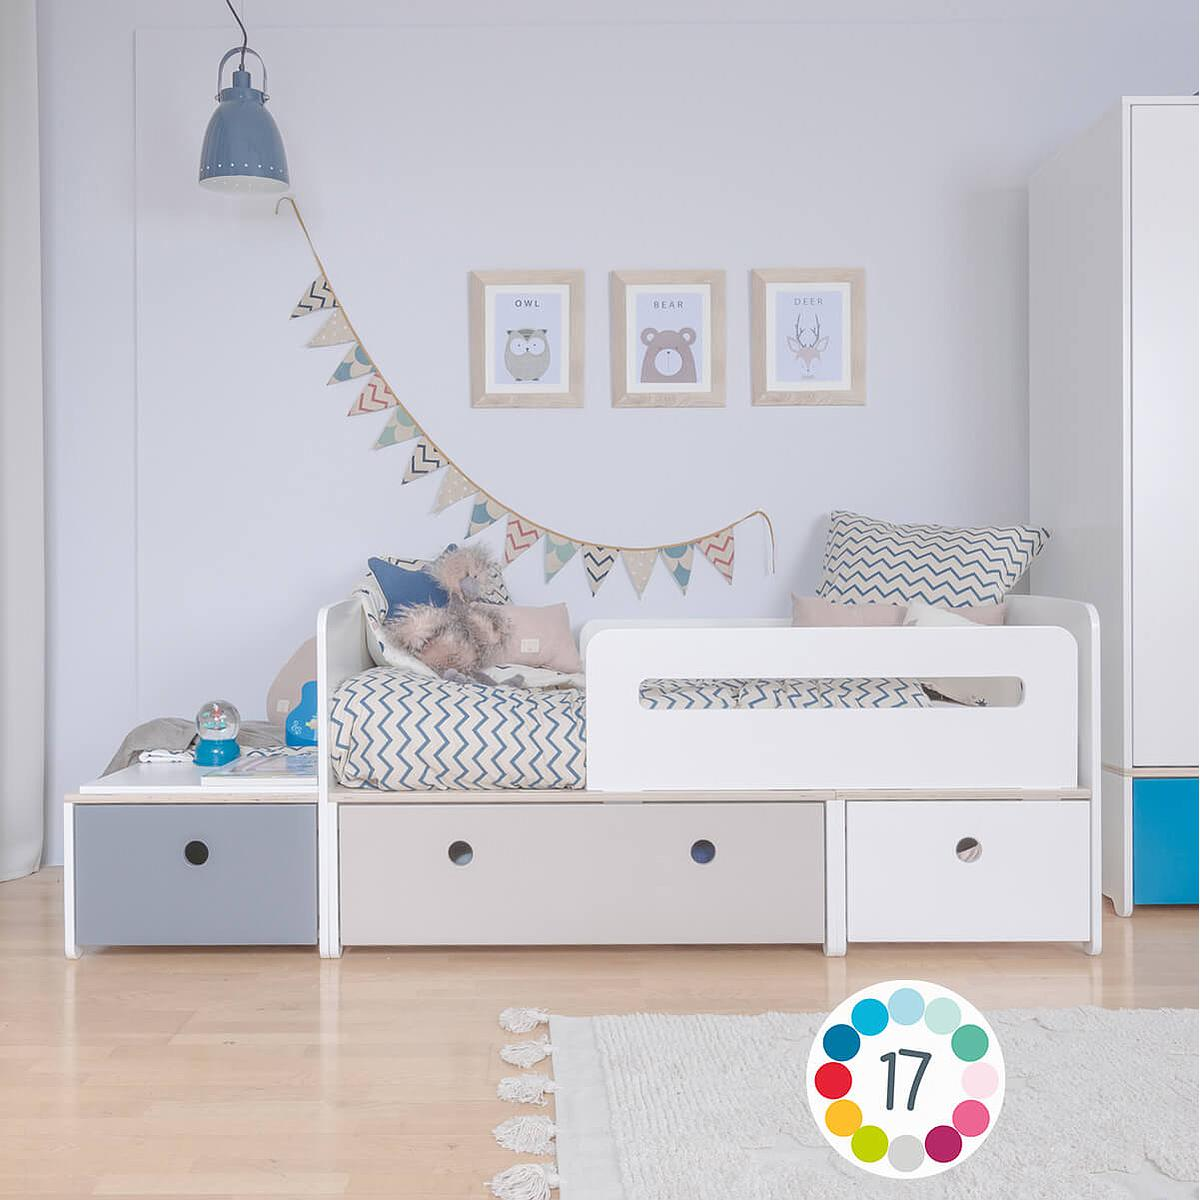 Cama evolutiva infantil 90x150/200cm COLORFLEX warm grey-paradise blue-warm grey